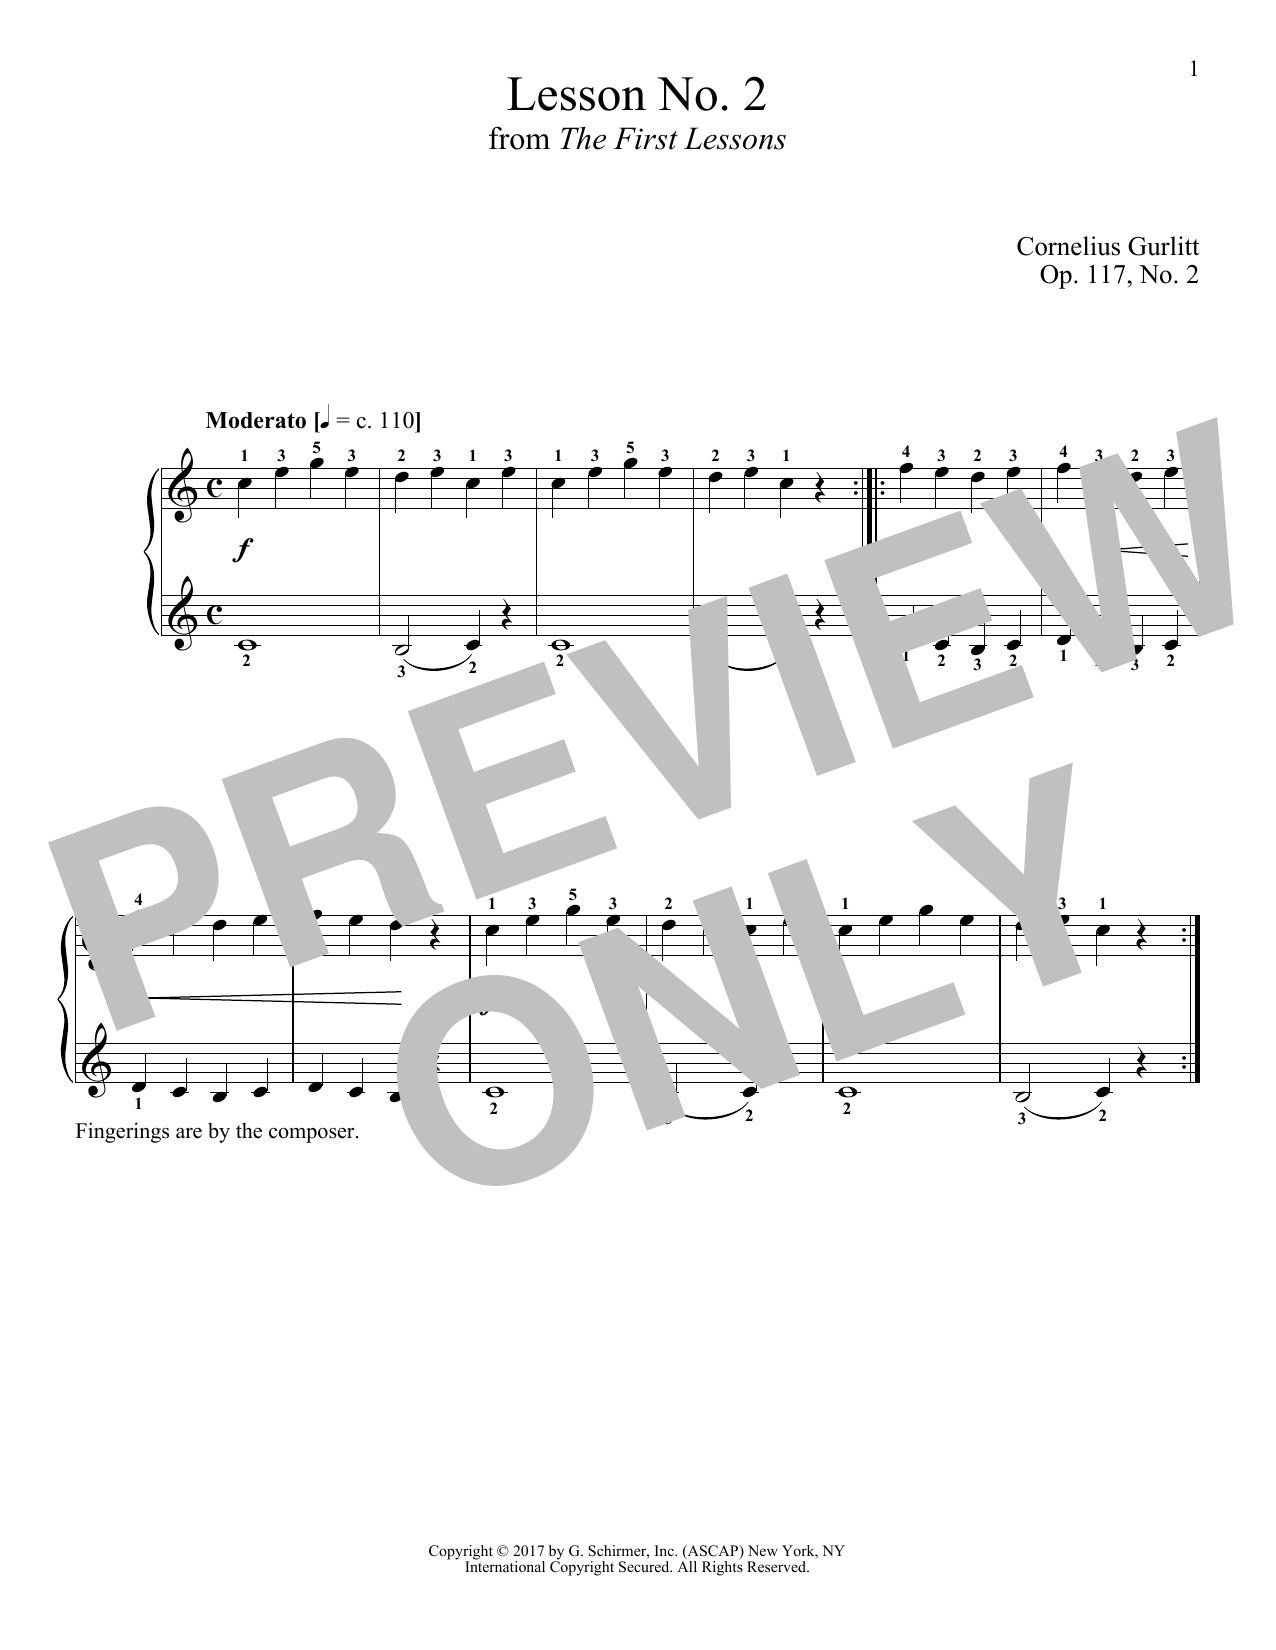 Cornelius Gurlitt Moderato, Op. 117, No. 2 sheet music notes and chords